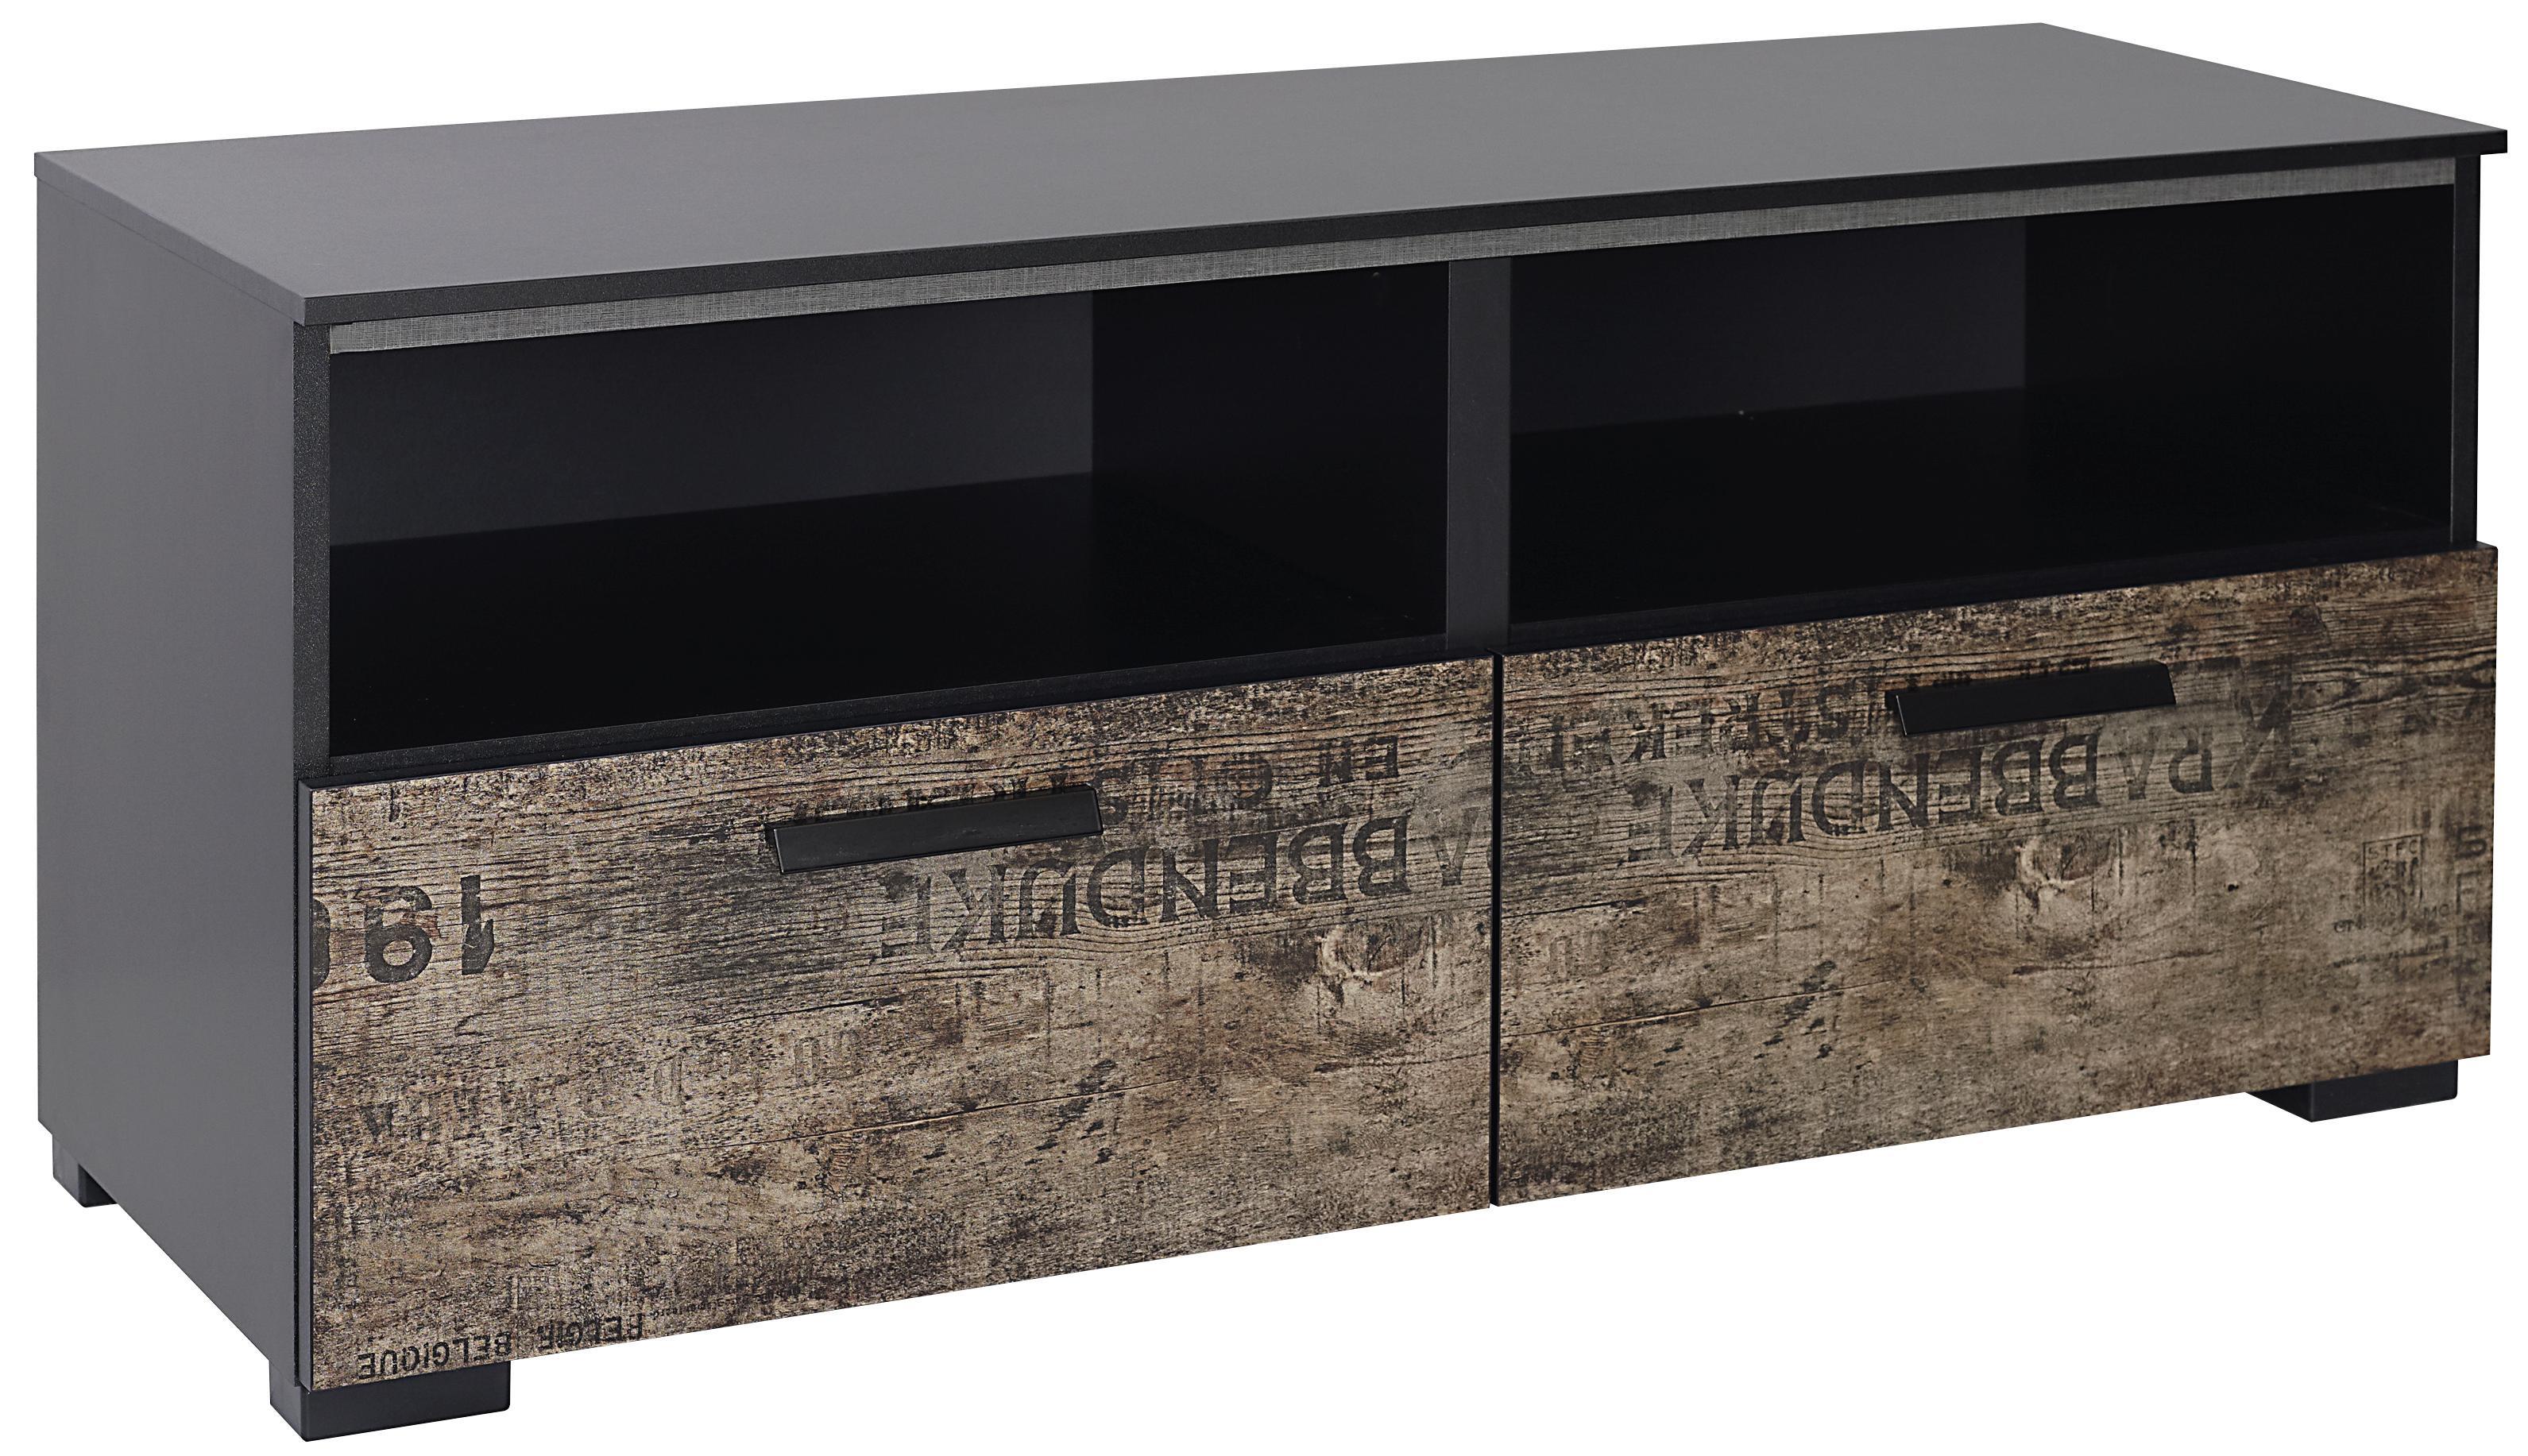 rauch select tvkommode sumatra vintage braun  ebay ~ Kare Tv Schrank Underground